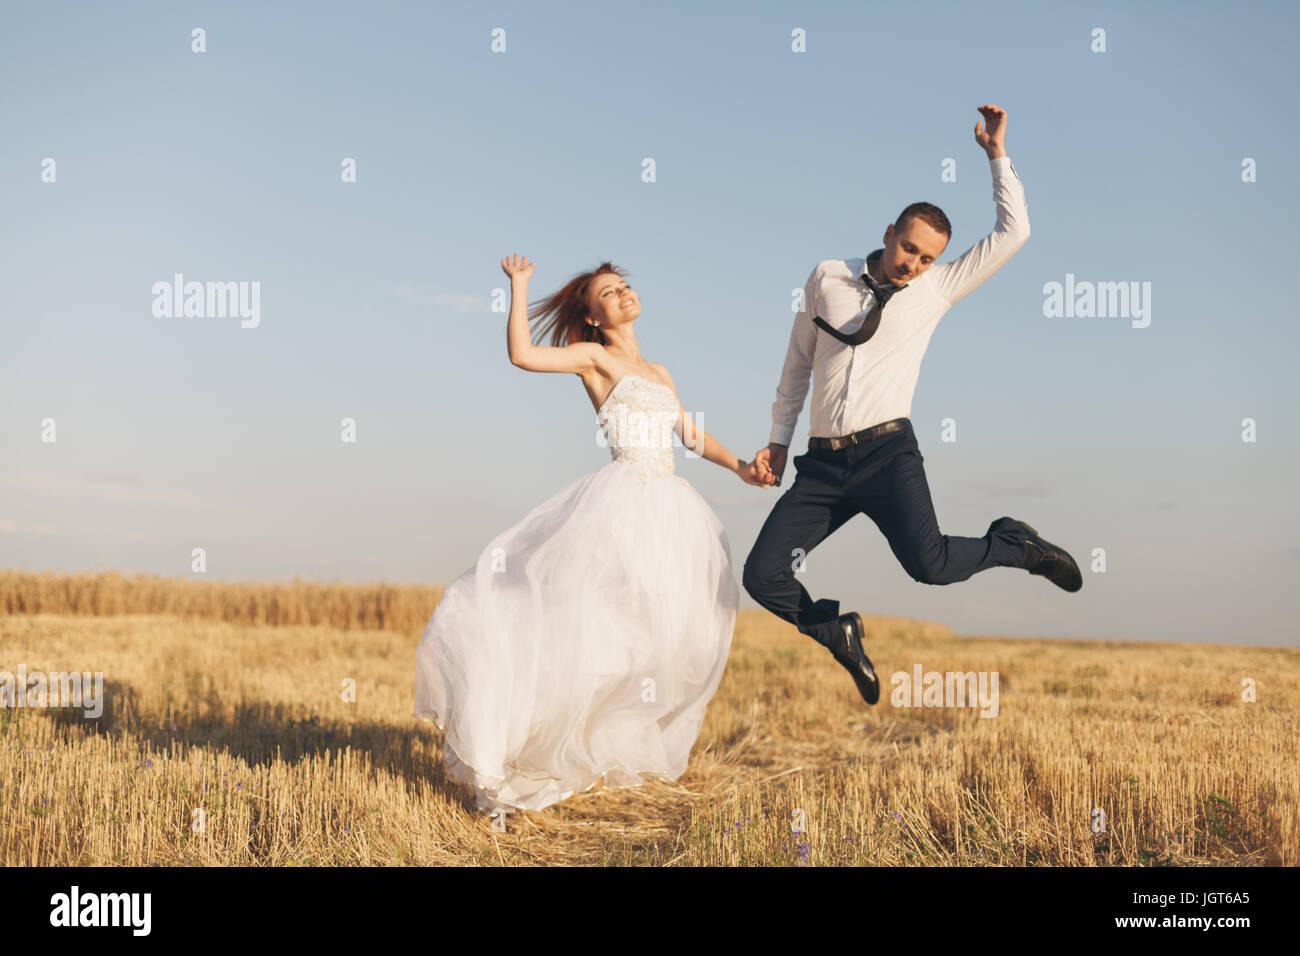 Redhead Bride Stockfotos & Redhead Bride Bilder - Seite 2 - Alamy